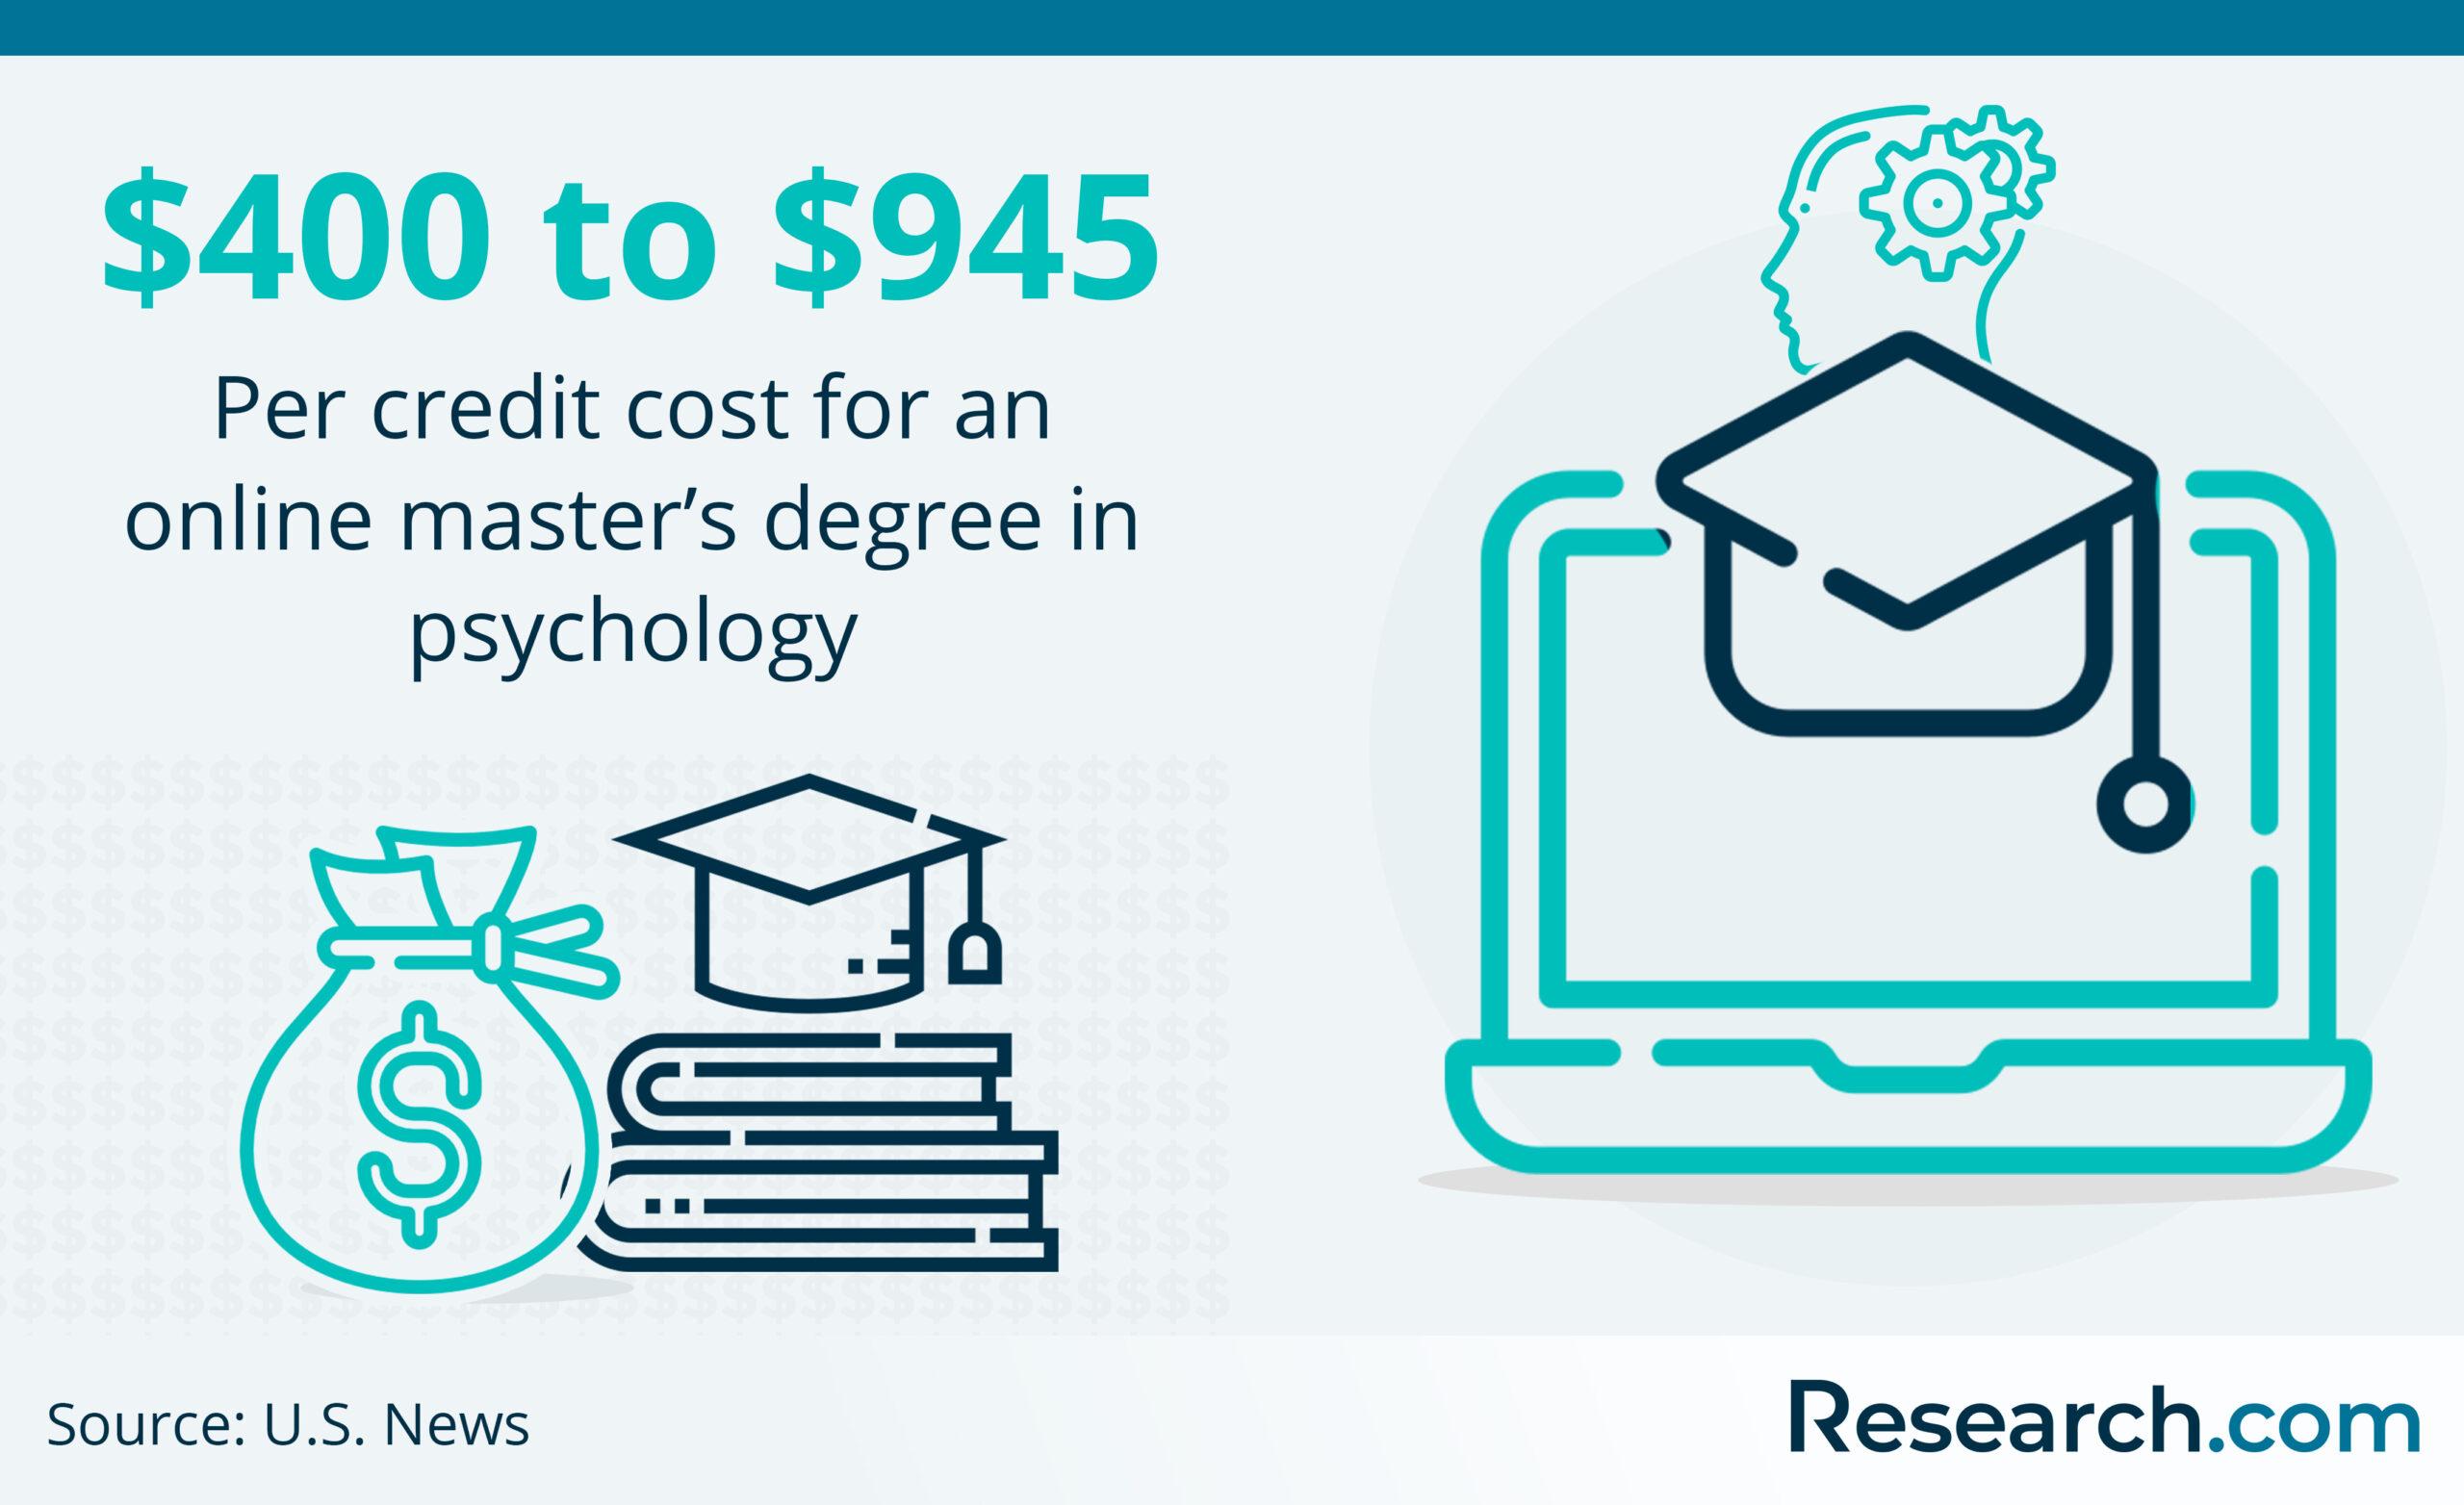 Online Master's in Psychology Image 4